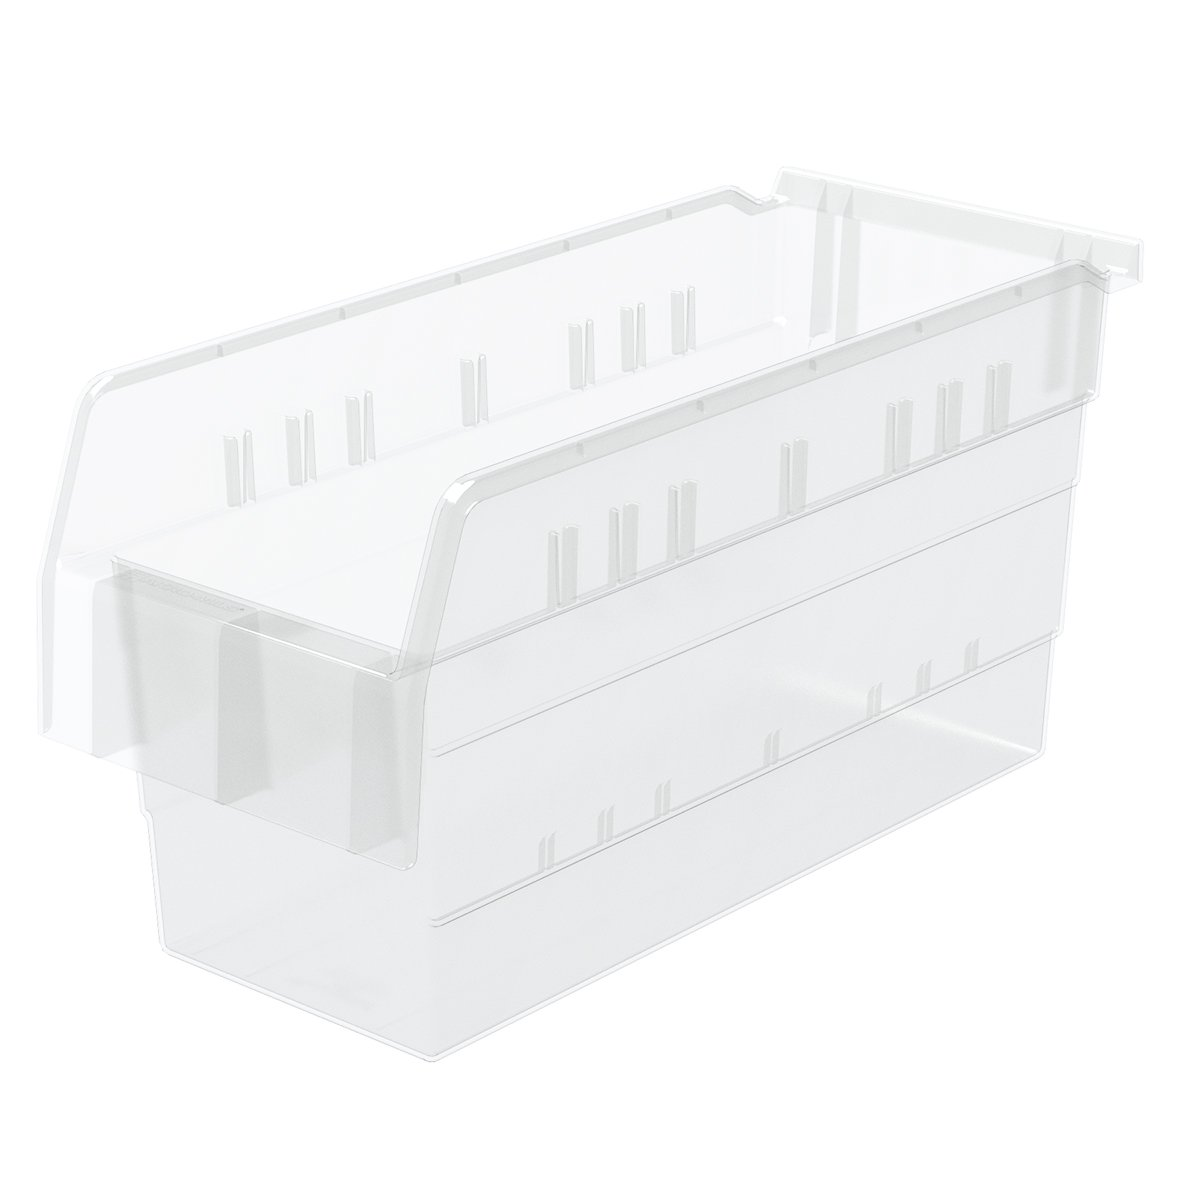 Akro-Mils 30866 ShelfMax 8 Plastic Nesting Shelf Bin Box, 16-Inch x 6-Inch x 8-Inch, Clear, 10-Pack